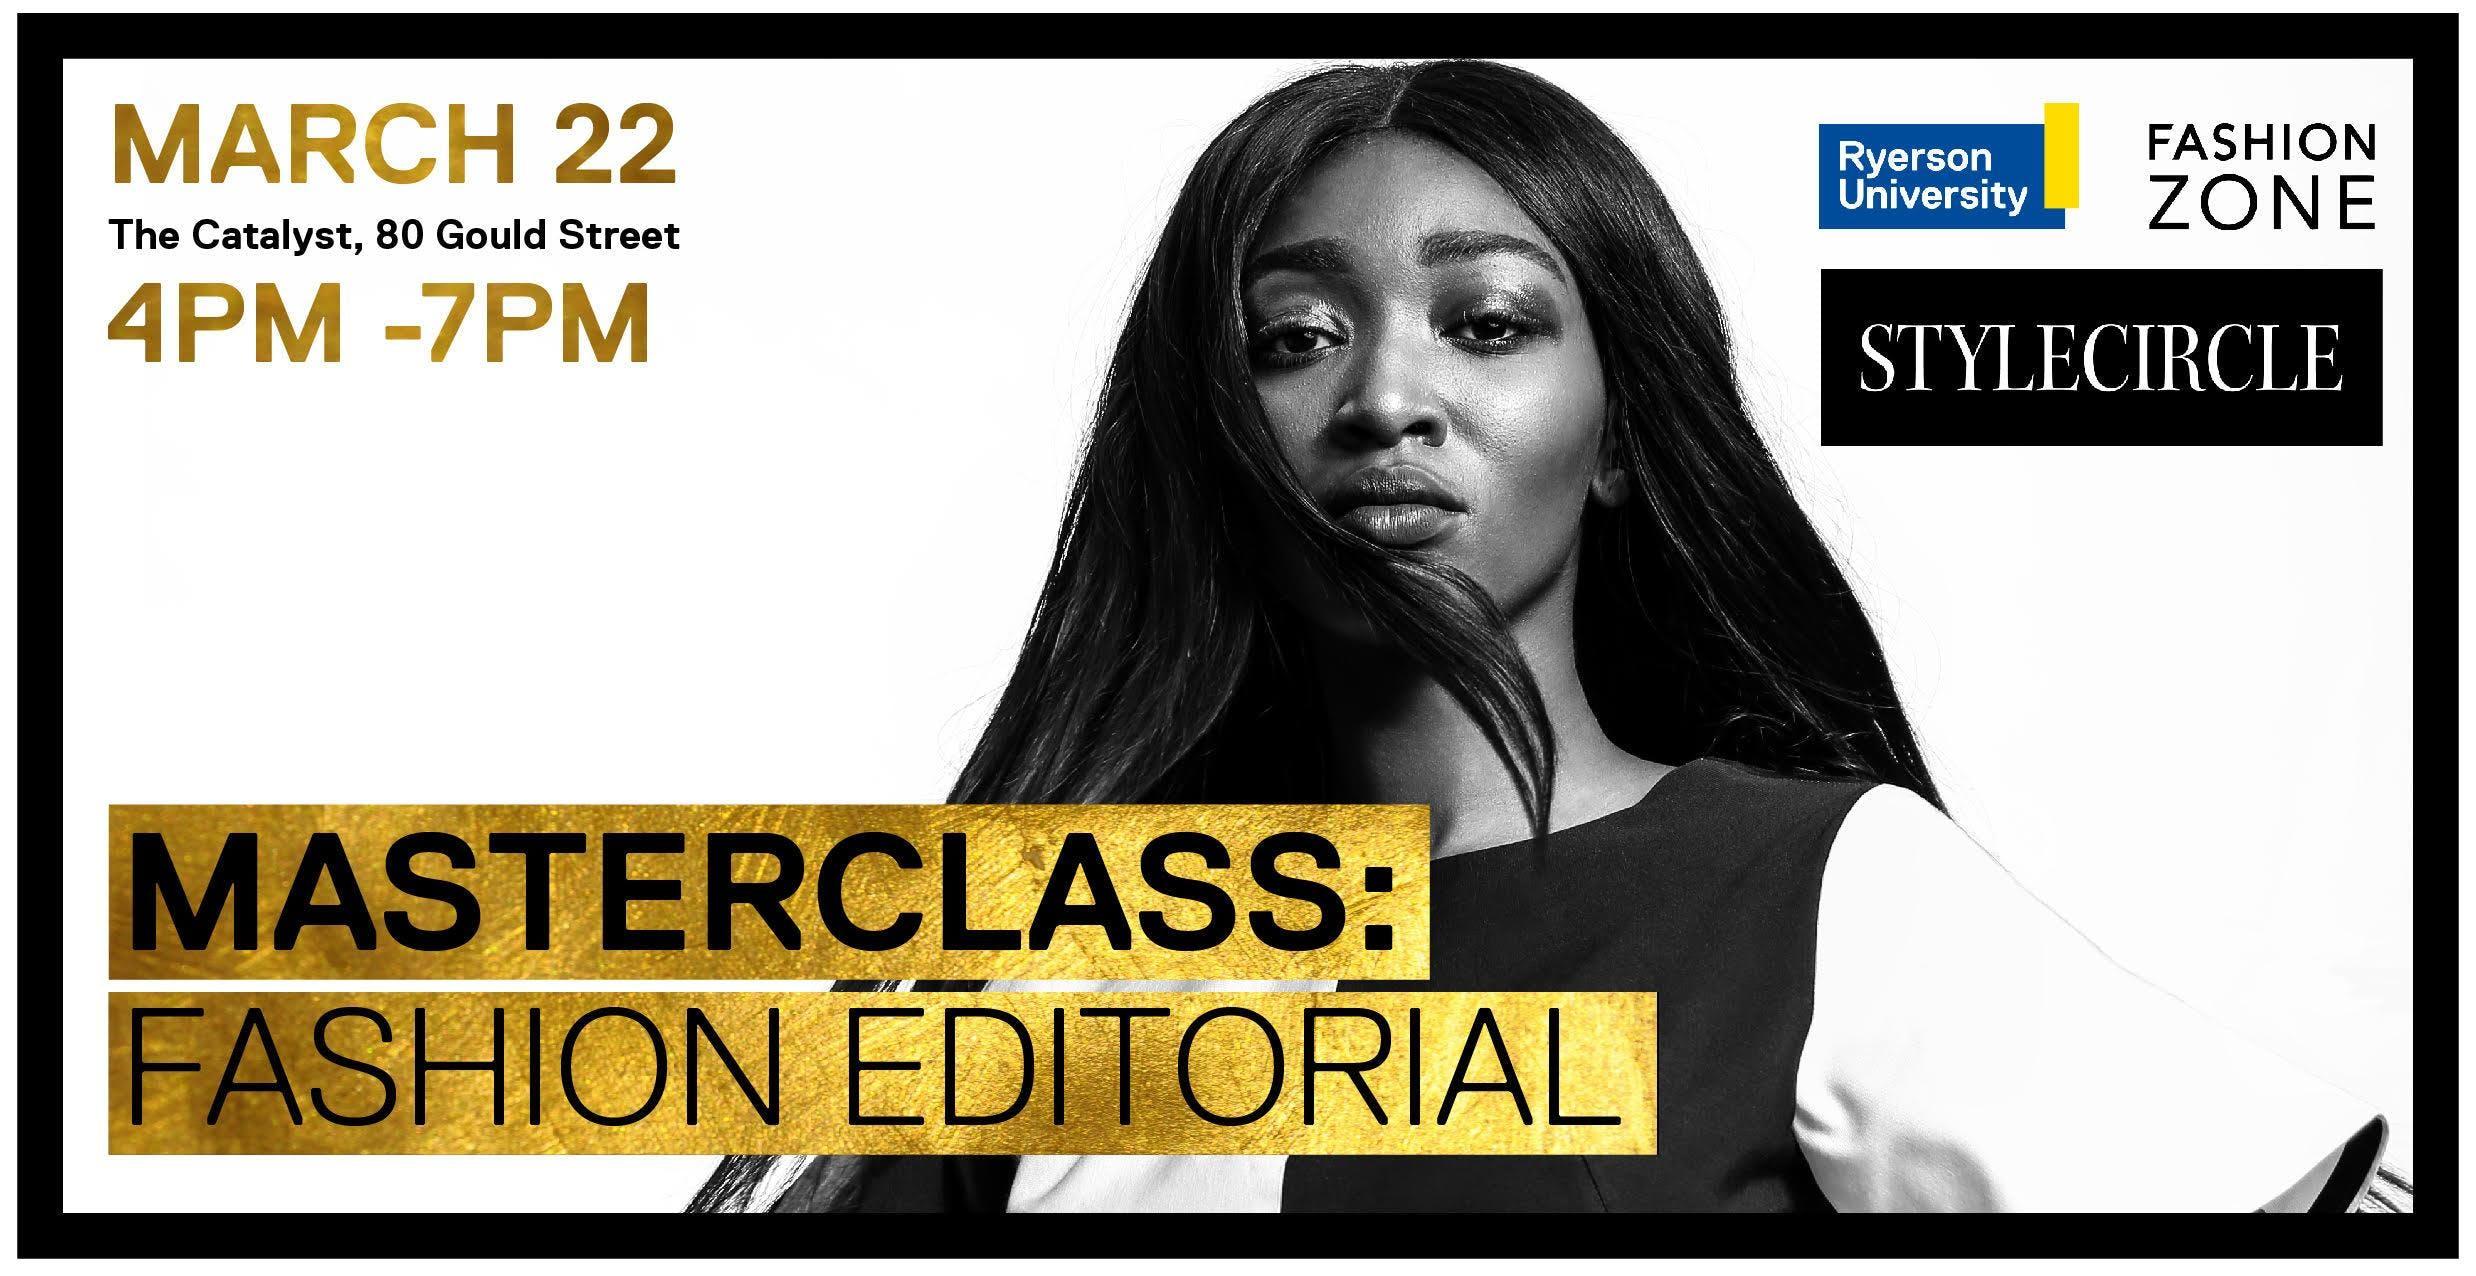 Masterclass - Fashion Editorial | Presented b